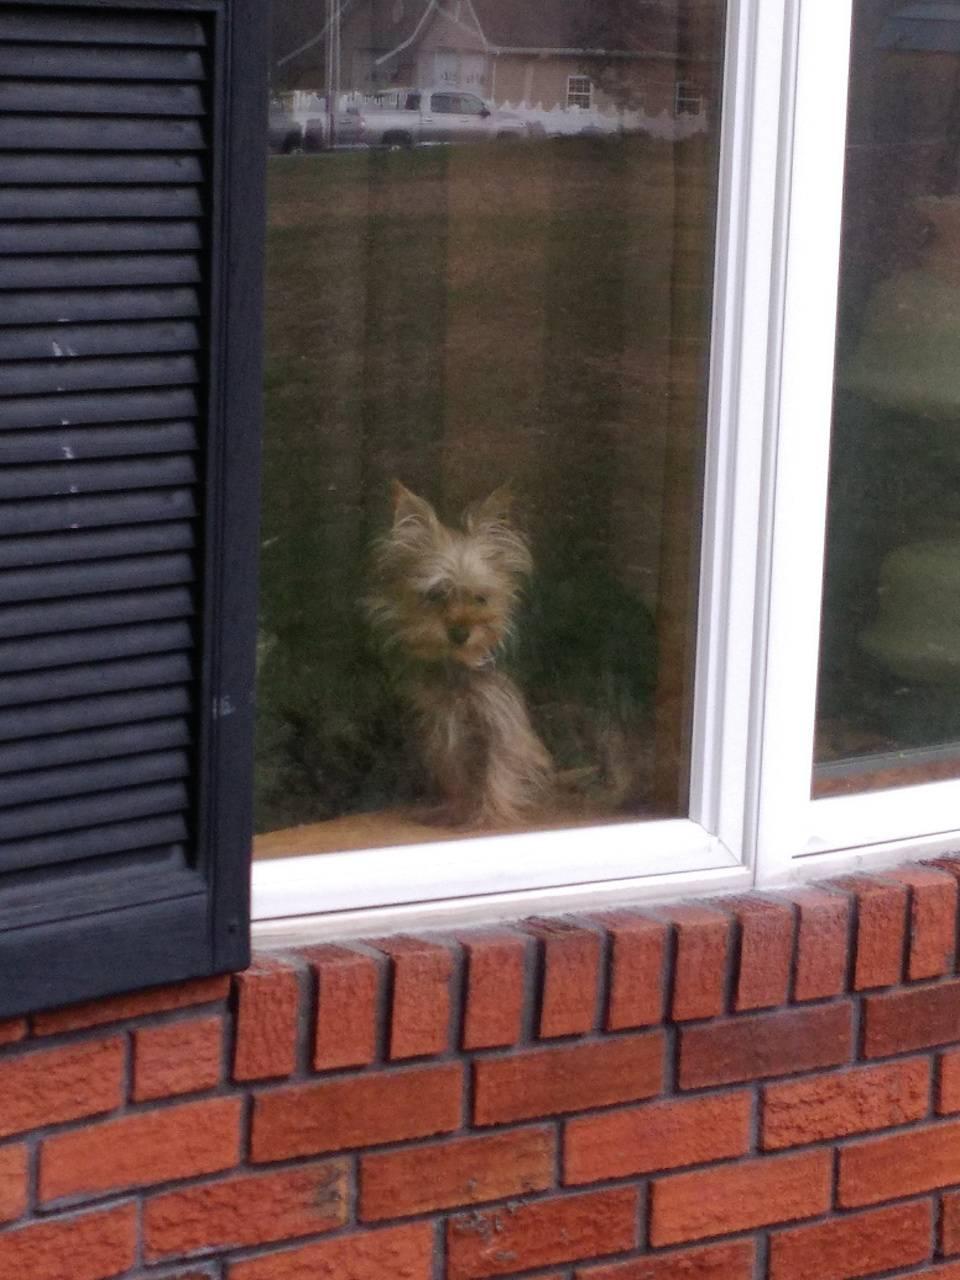 Puppy in window